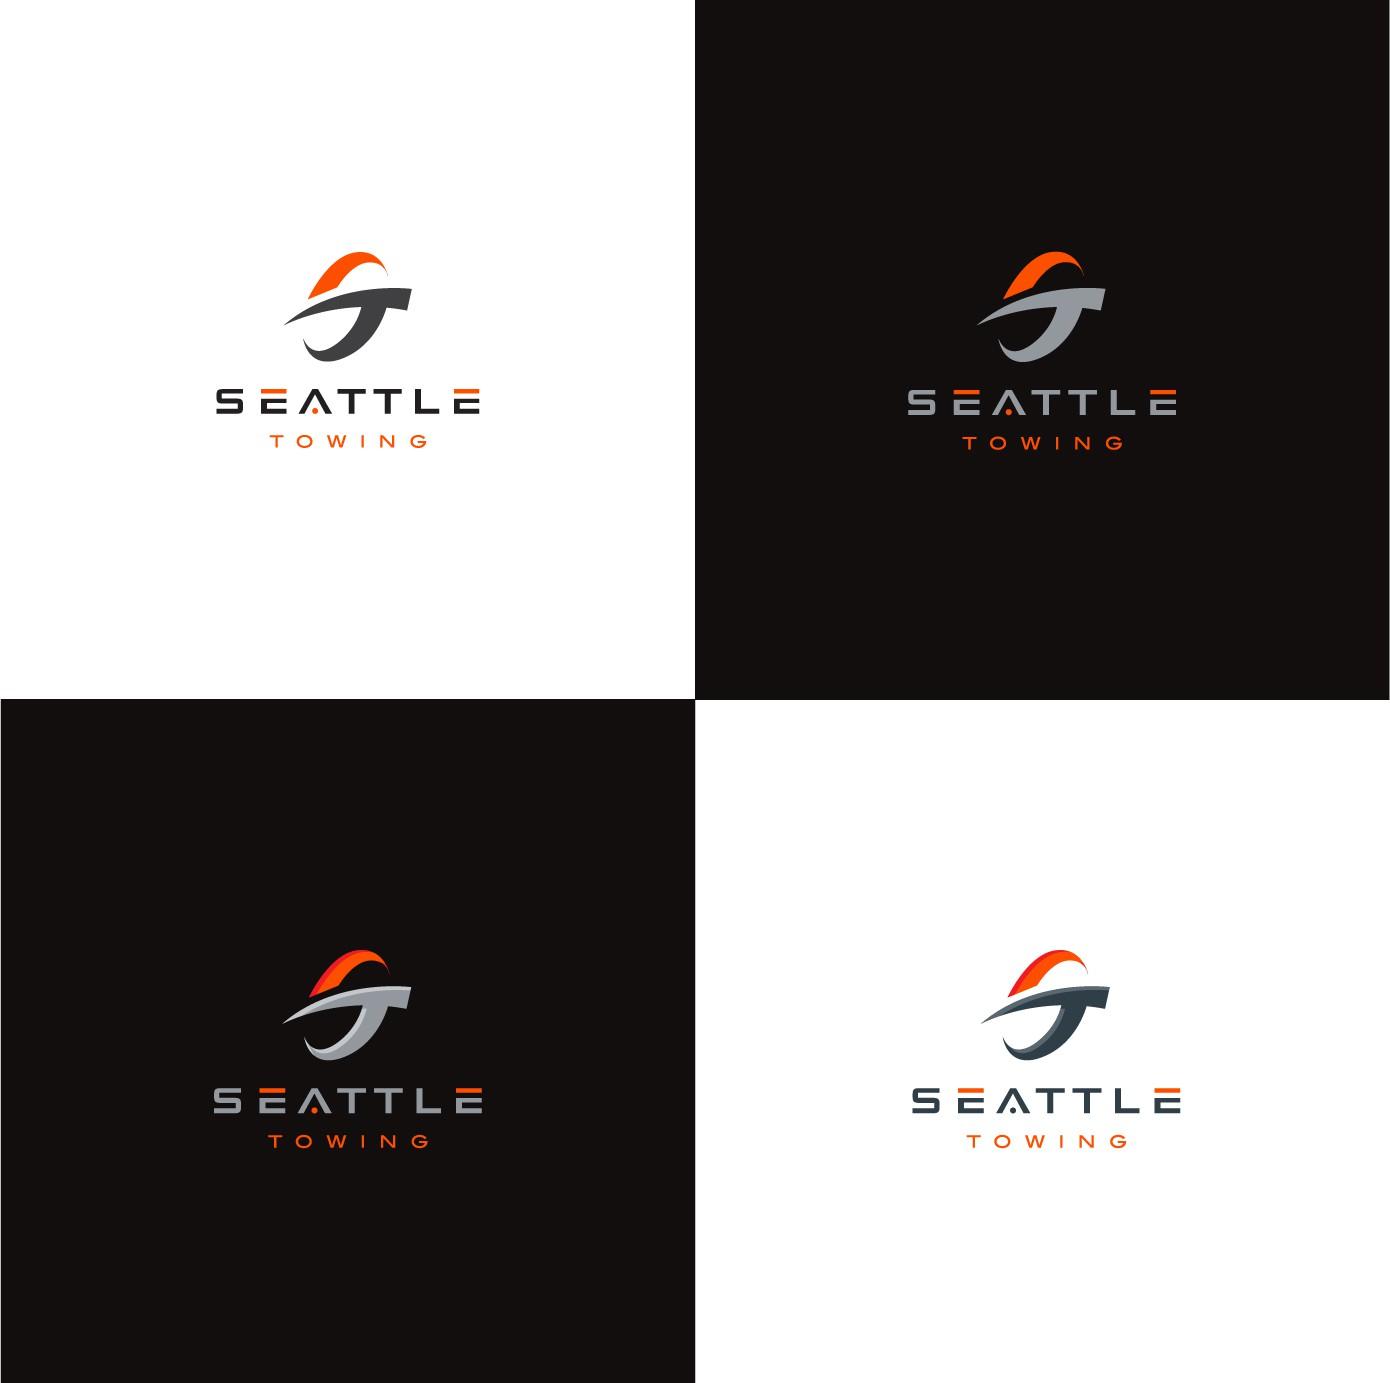 Seattle Towing (Design Phase -I)